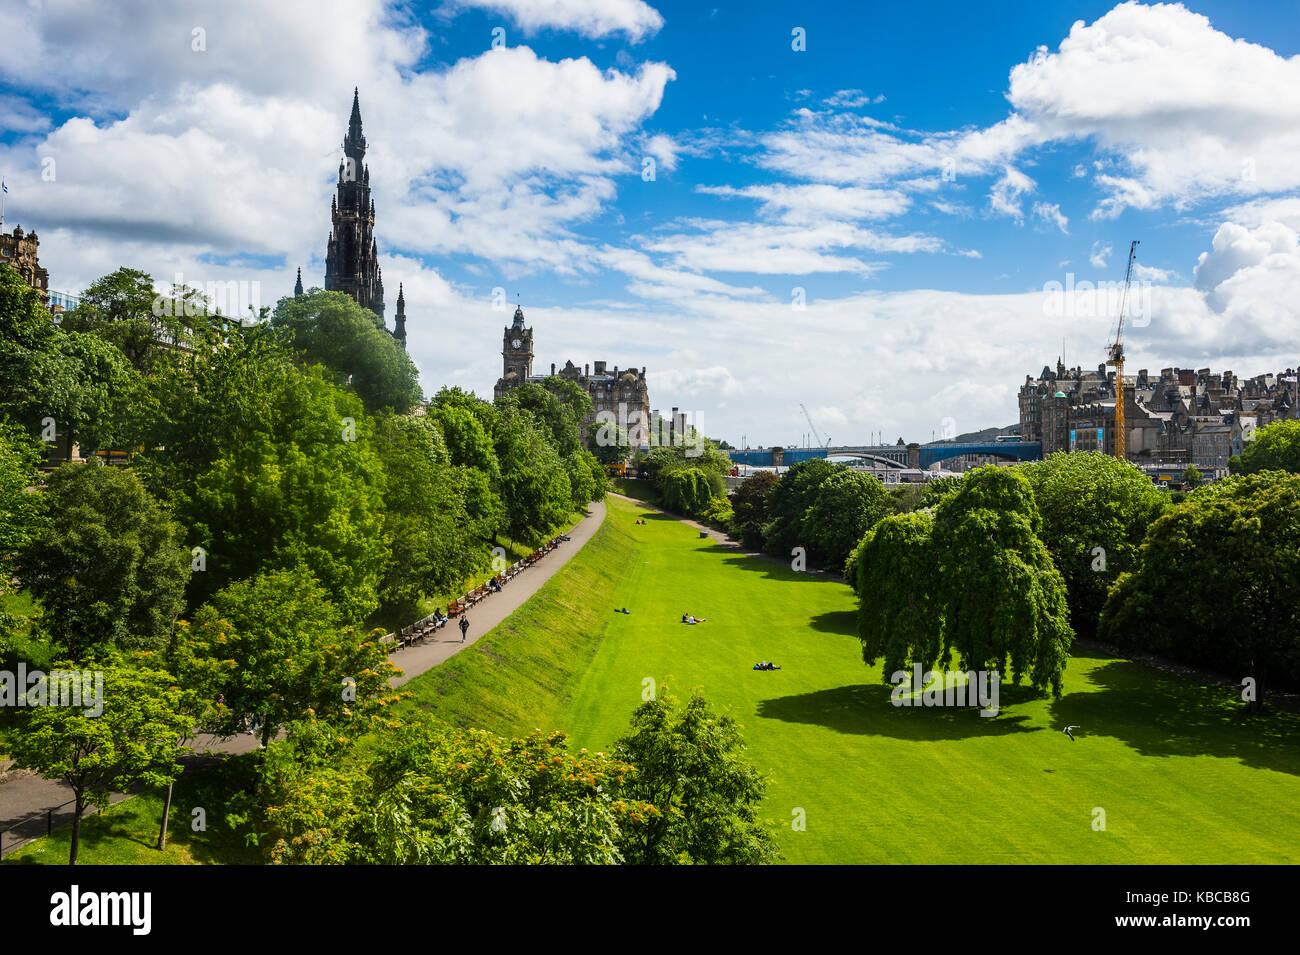 View over Princes Street Gardens, Edinburgh, Scotland, United Kingdom, Europe - Stock Image